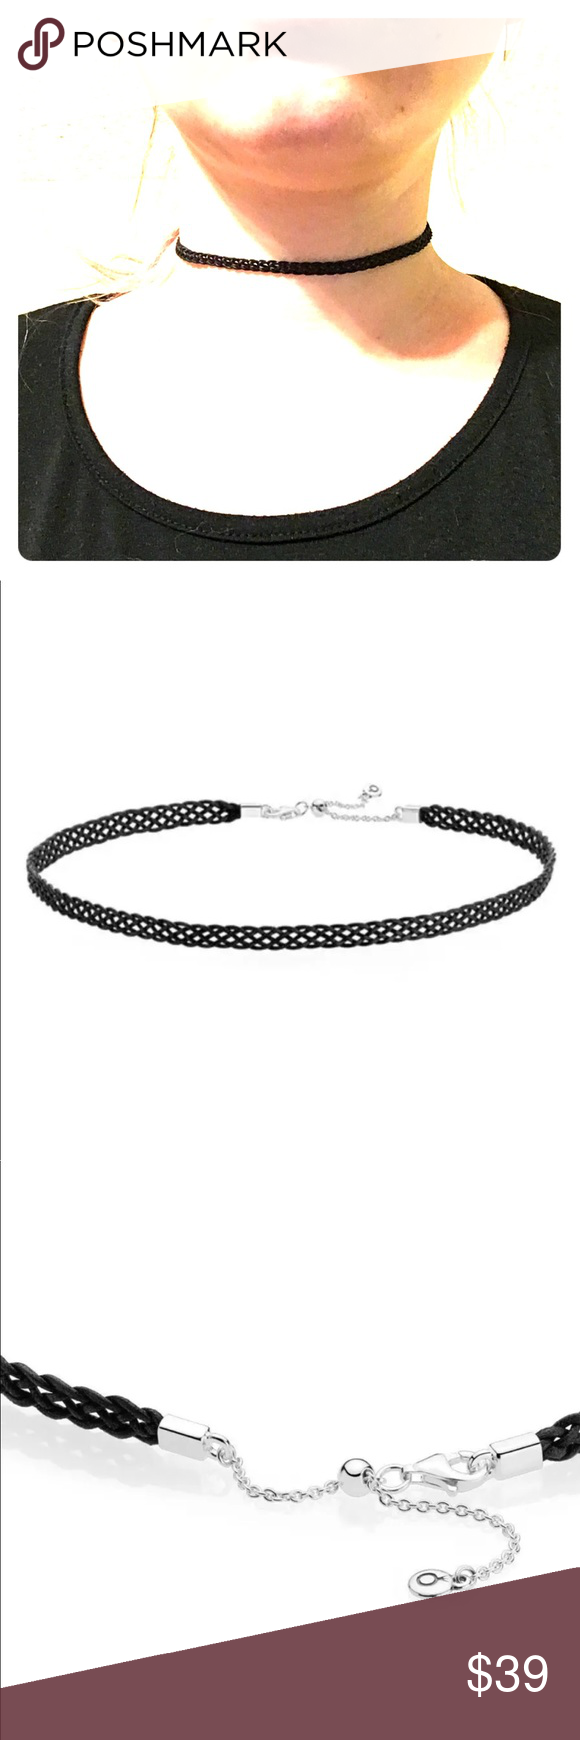 142848eb4 Black Woven Fabric Choker Necklace 12.5